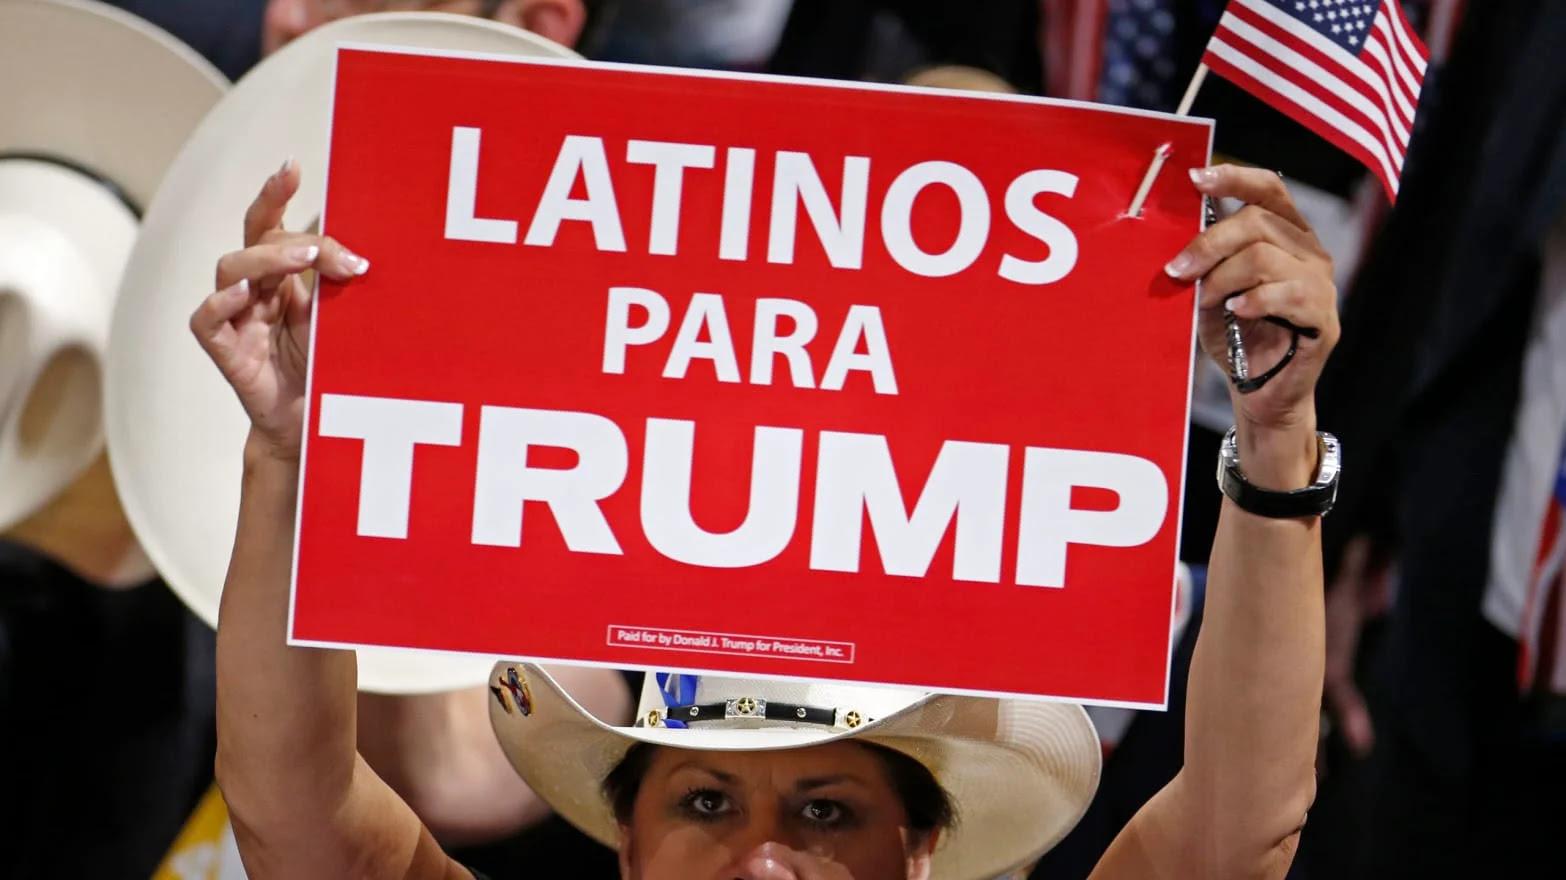 A woman at a rally for Trump holding a sign reading ''Latinos Para Trump''